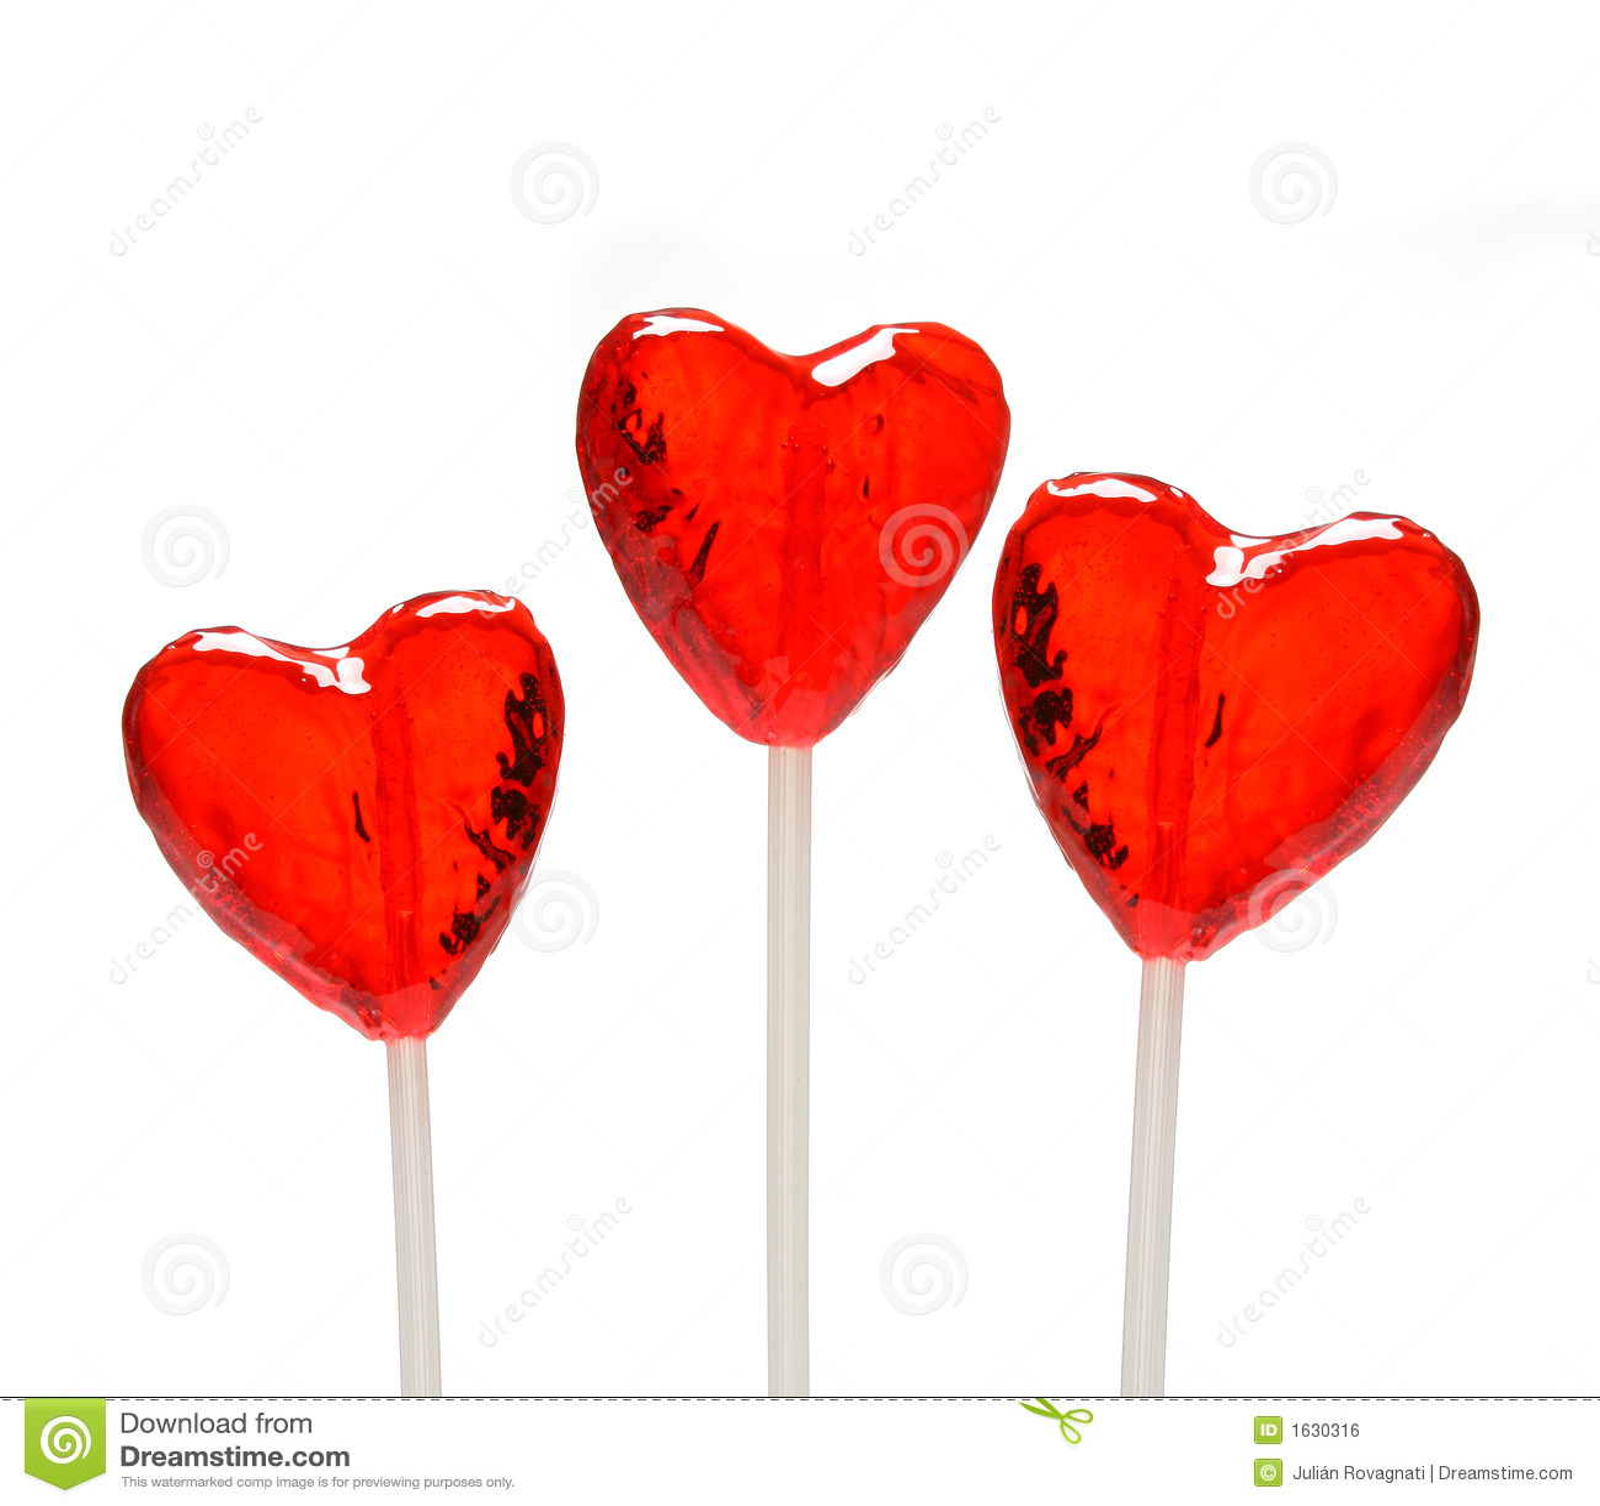 three heart shaped lollipops for valentine - Valentine Lollipops